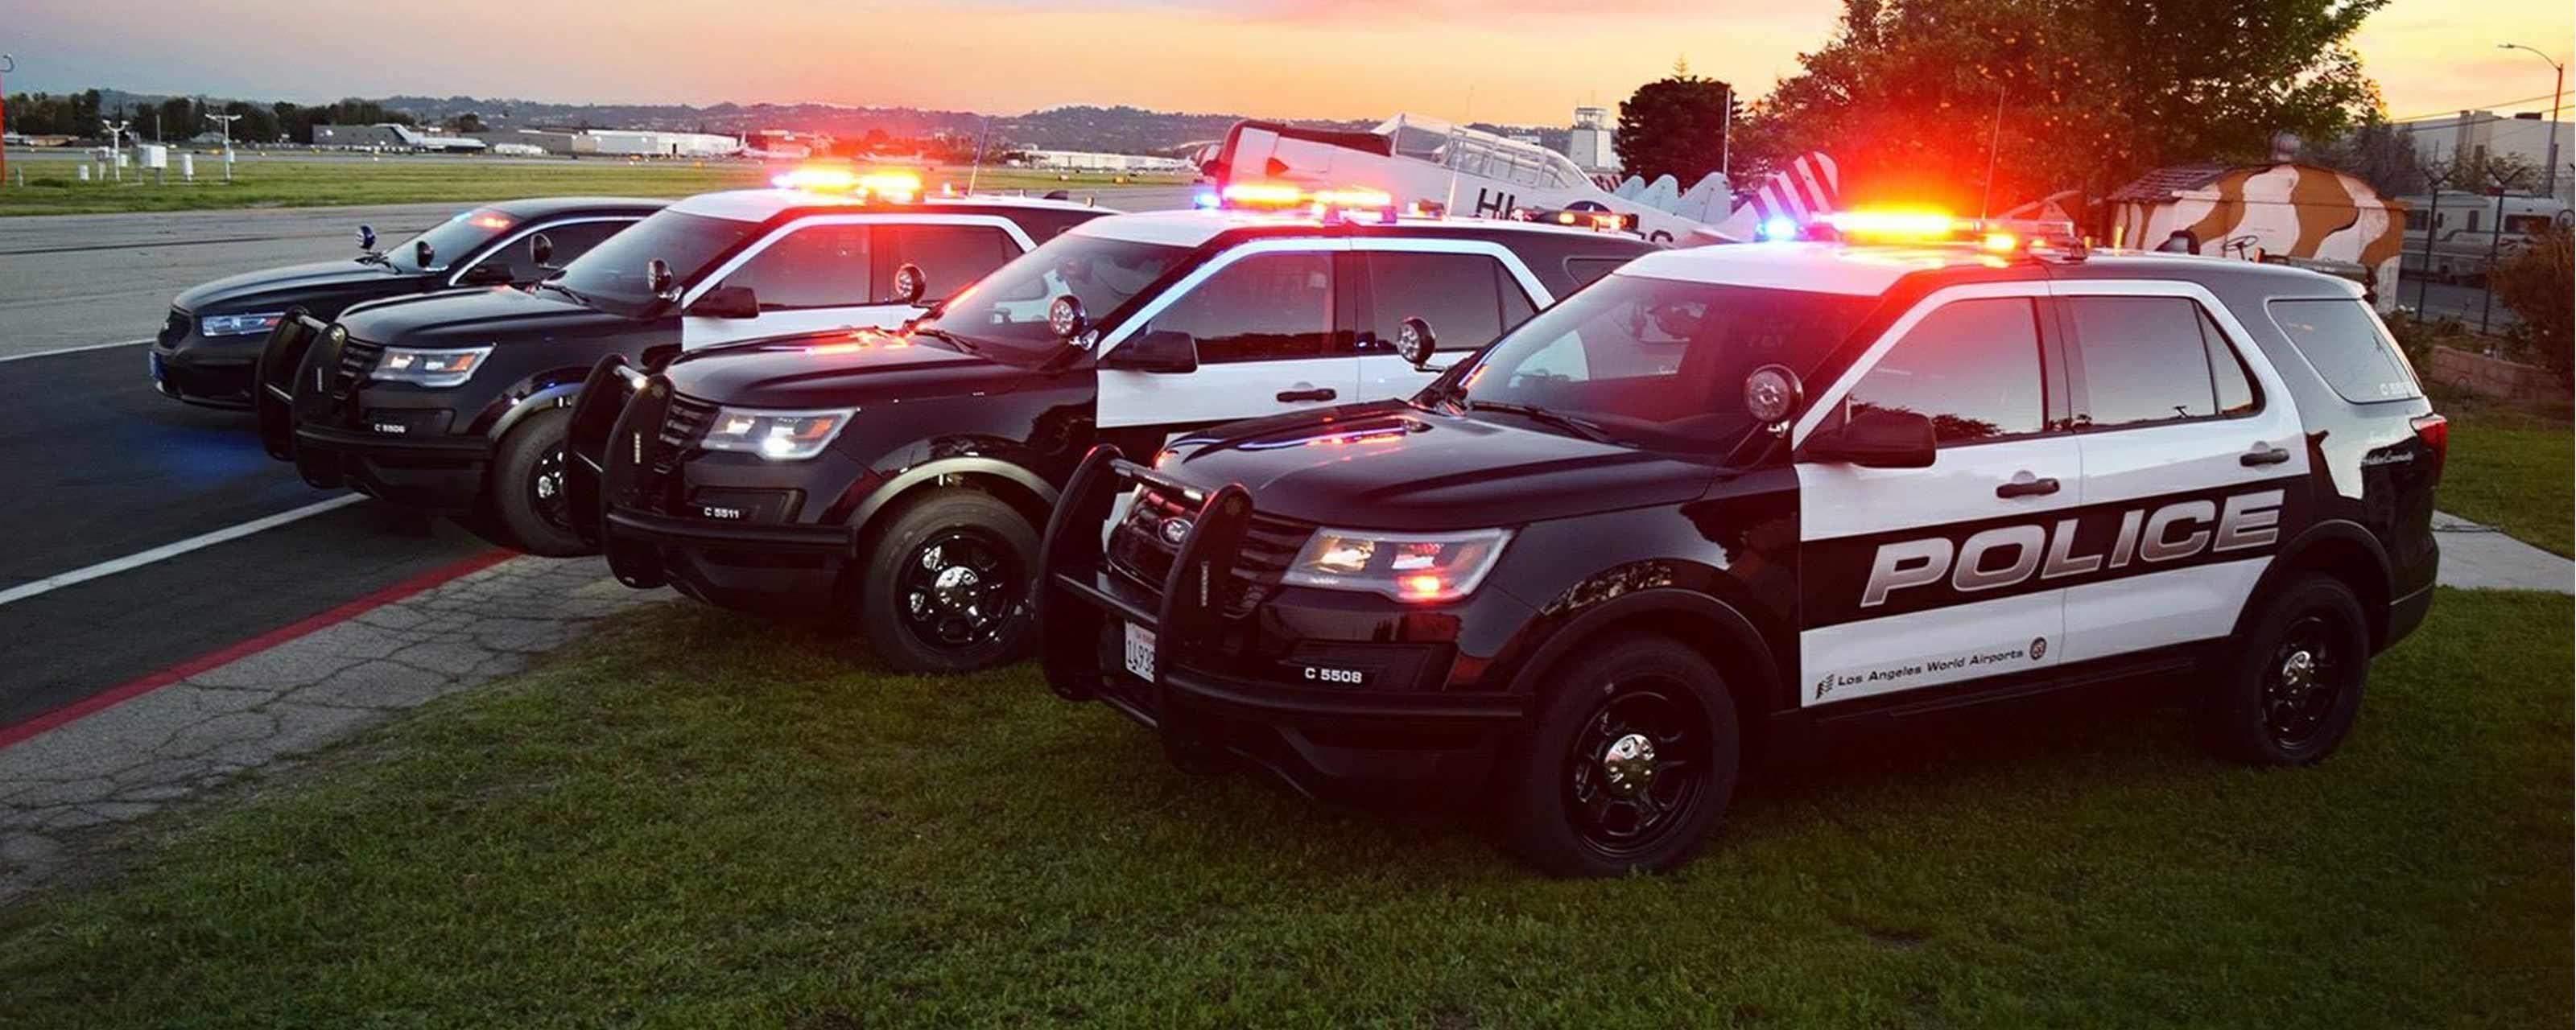 Patrol Cars